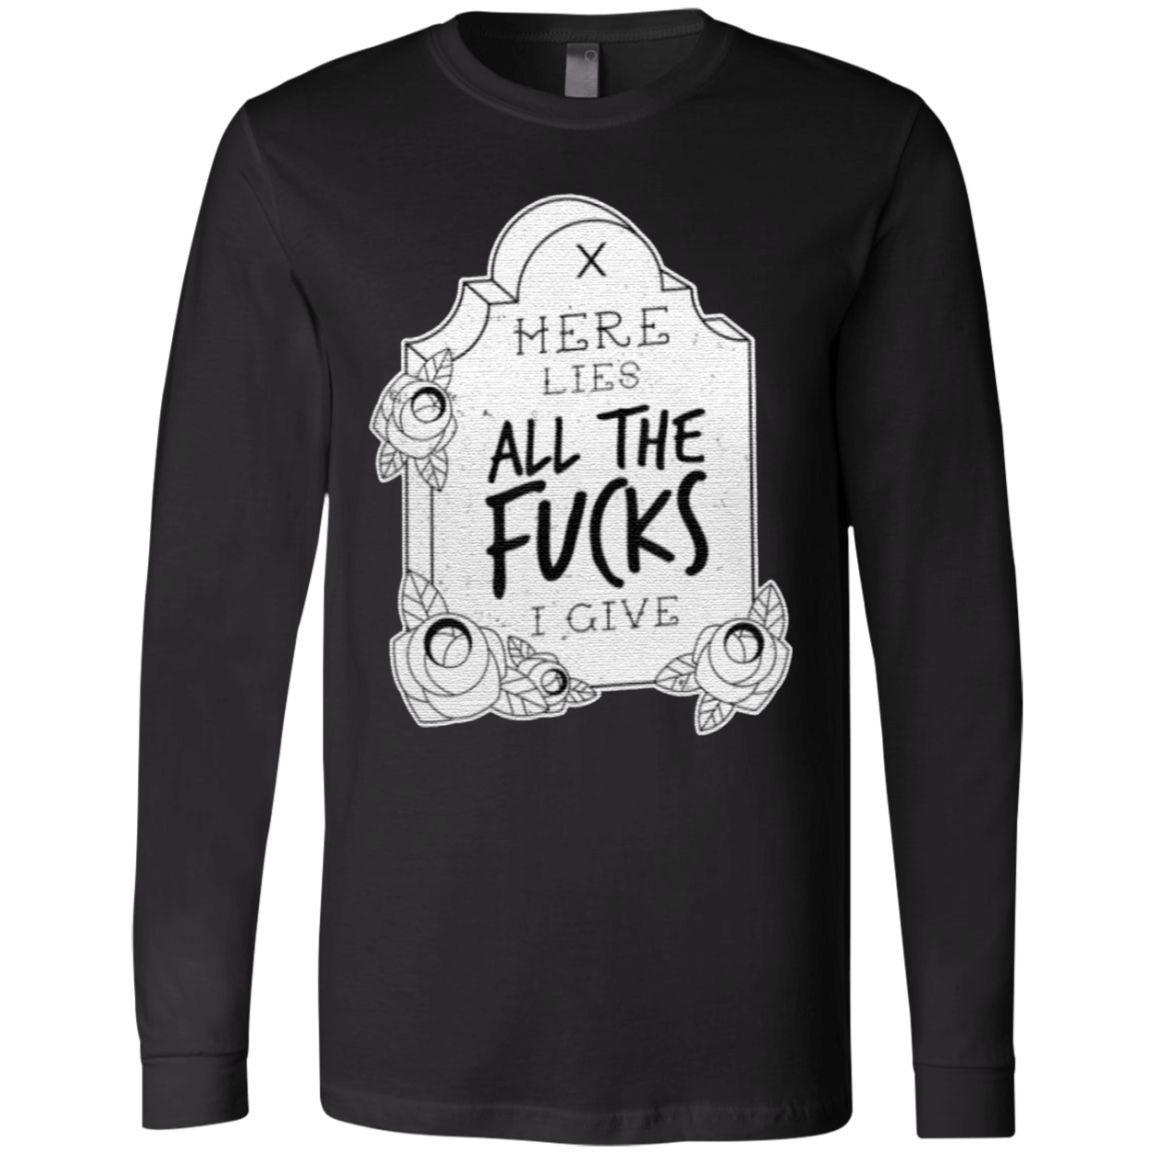 Sarcastic Tombstone Retro Aesthetic Goth T-Shirt